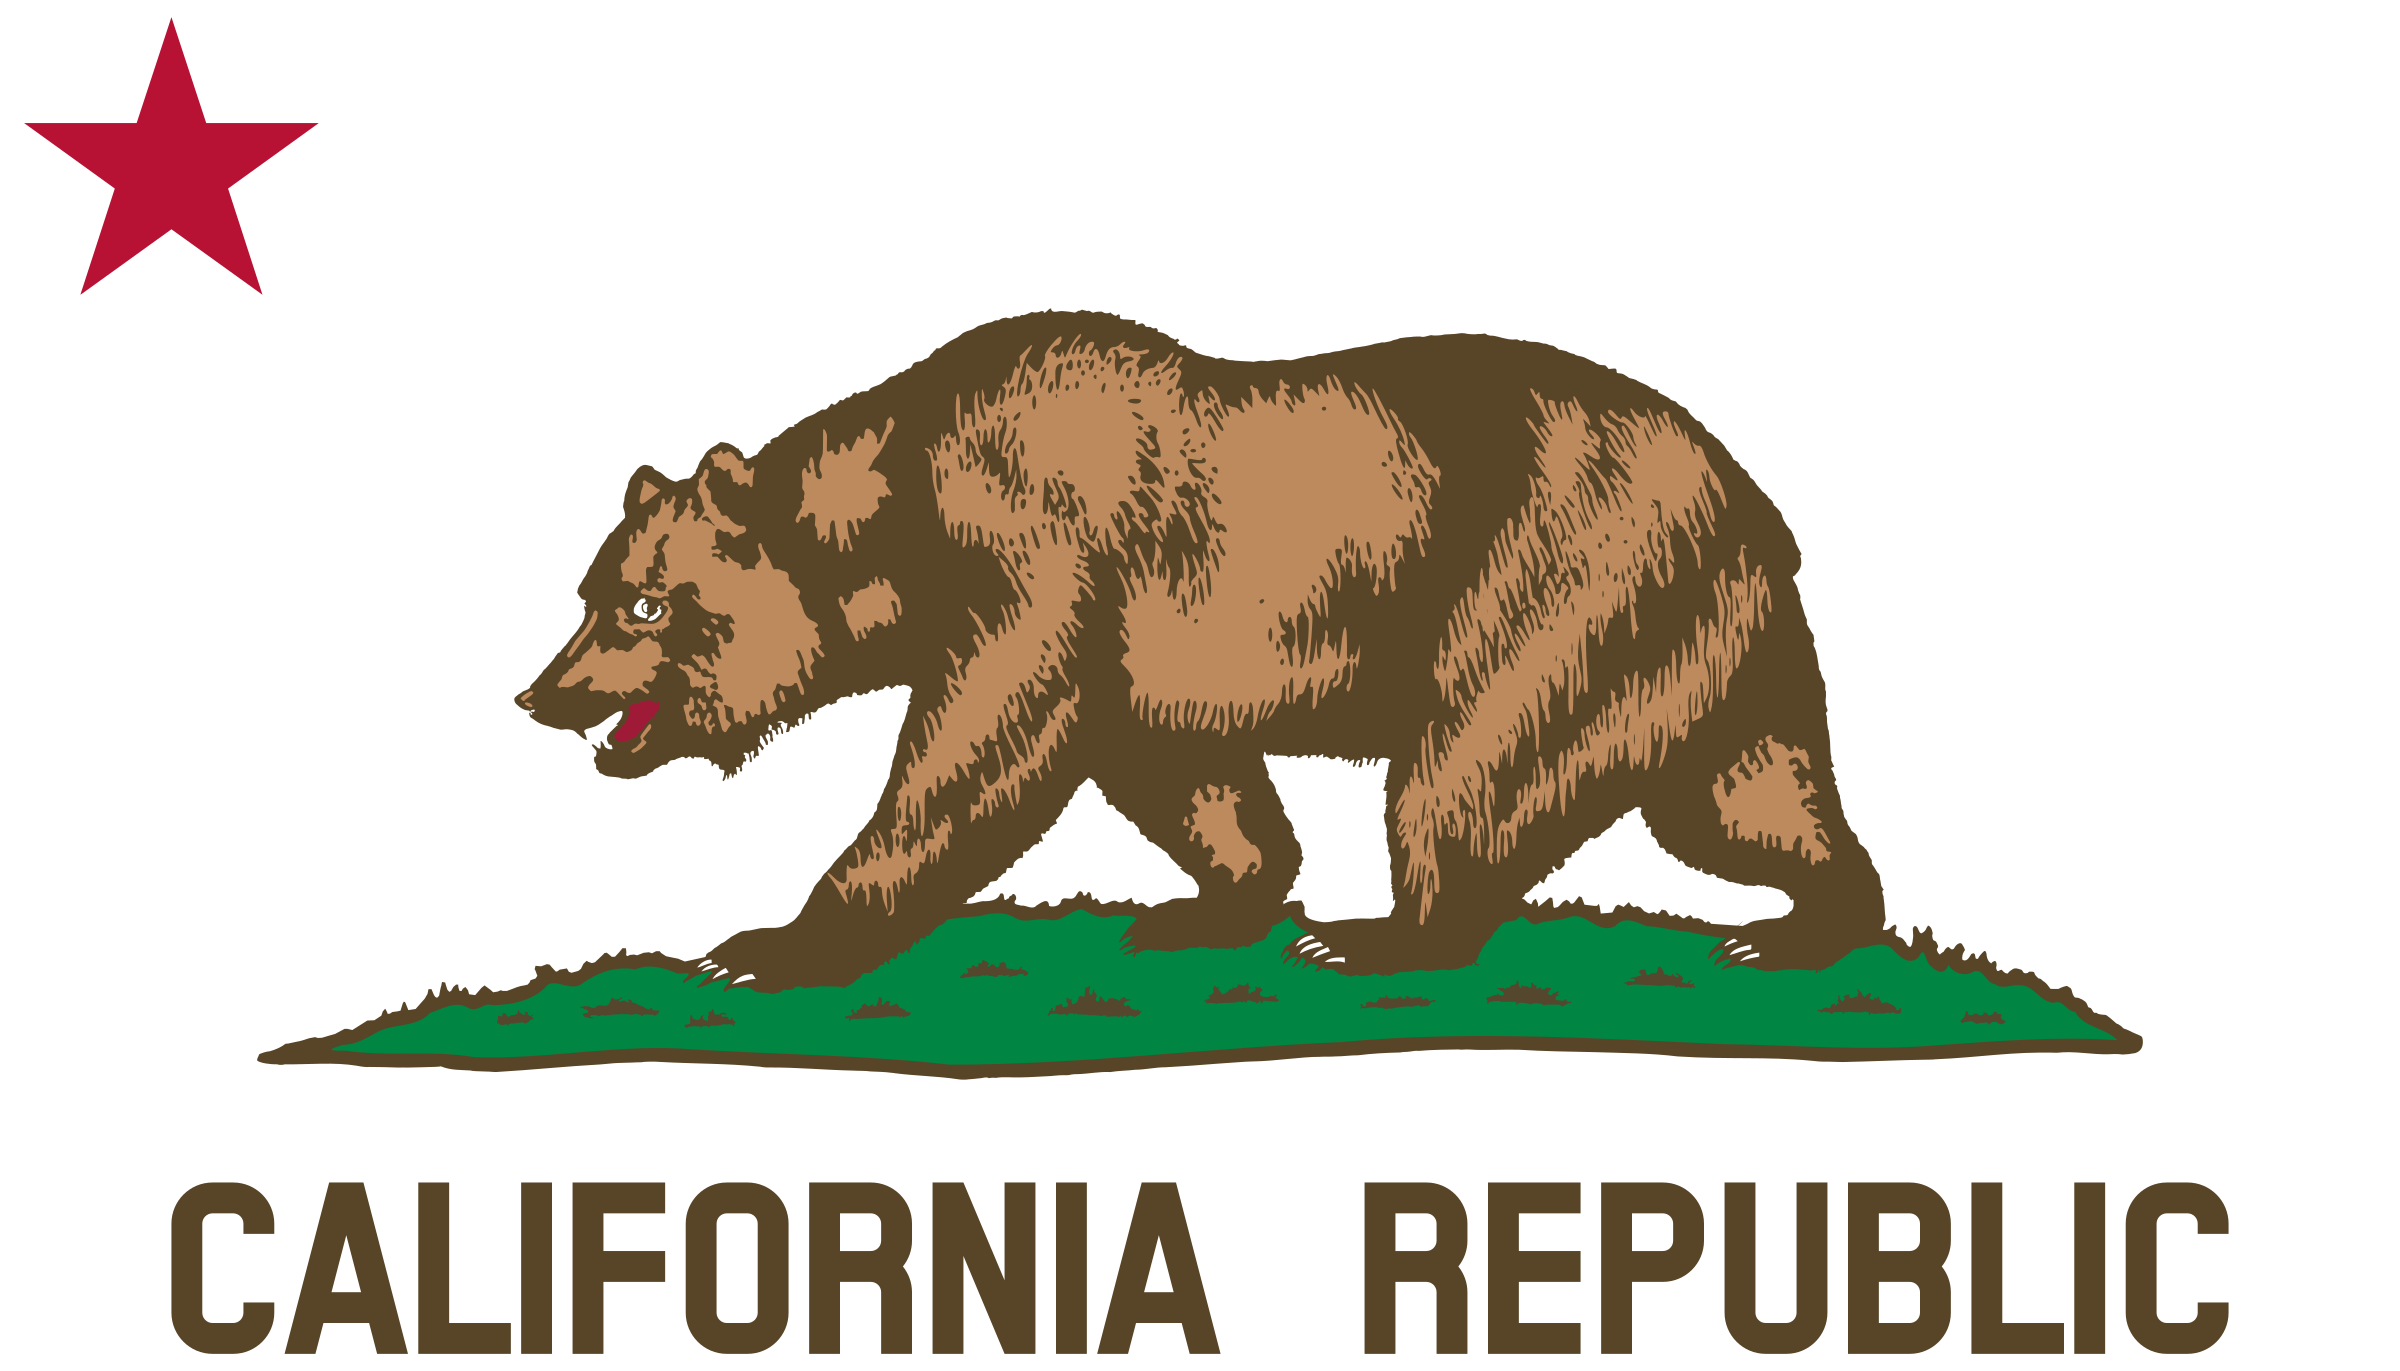 Proud clipart star. Flag of california bear